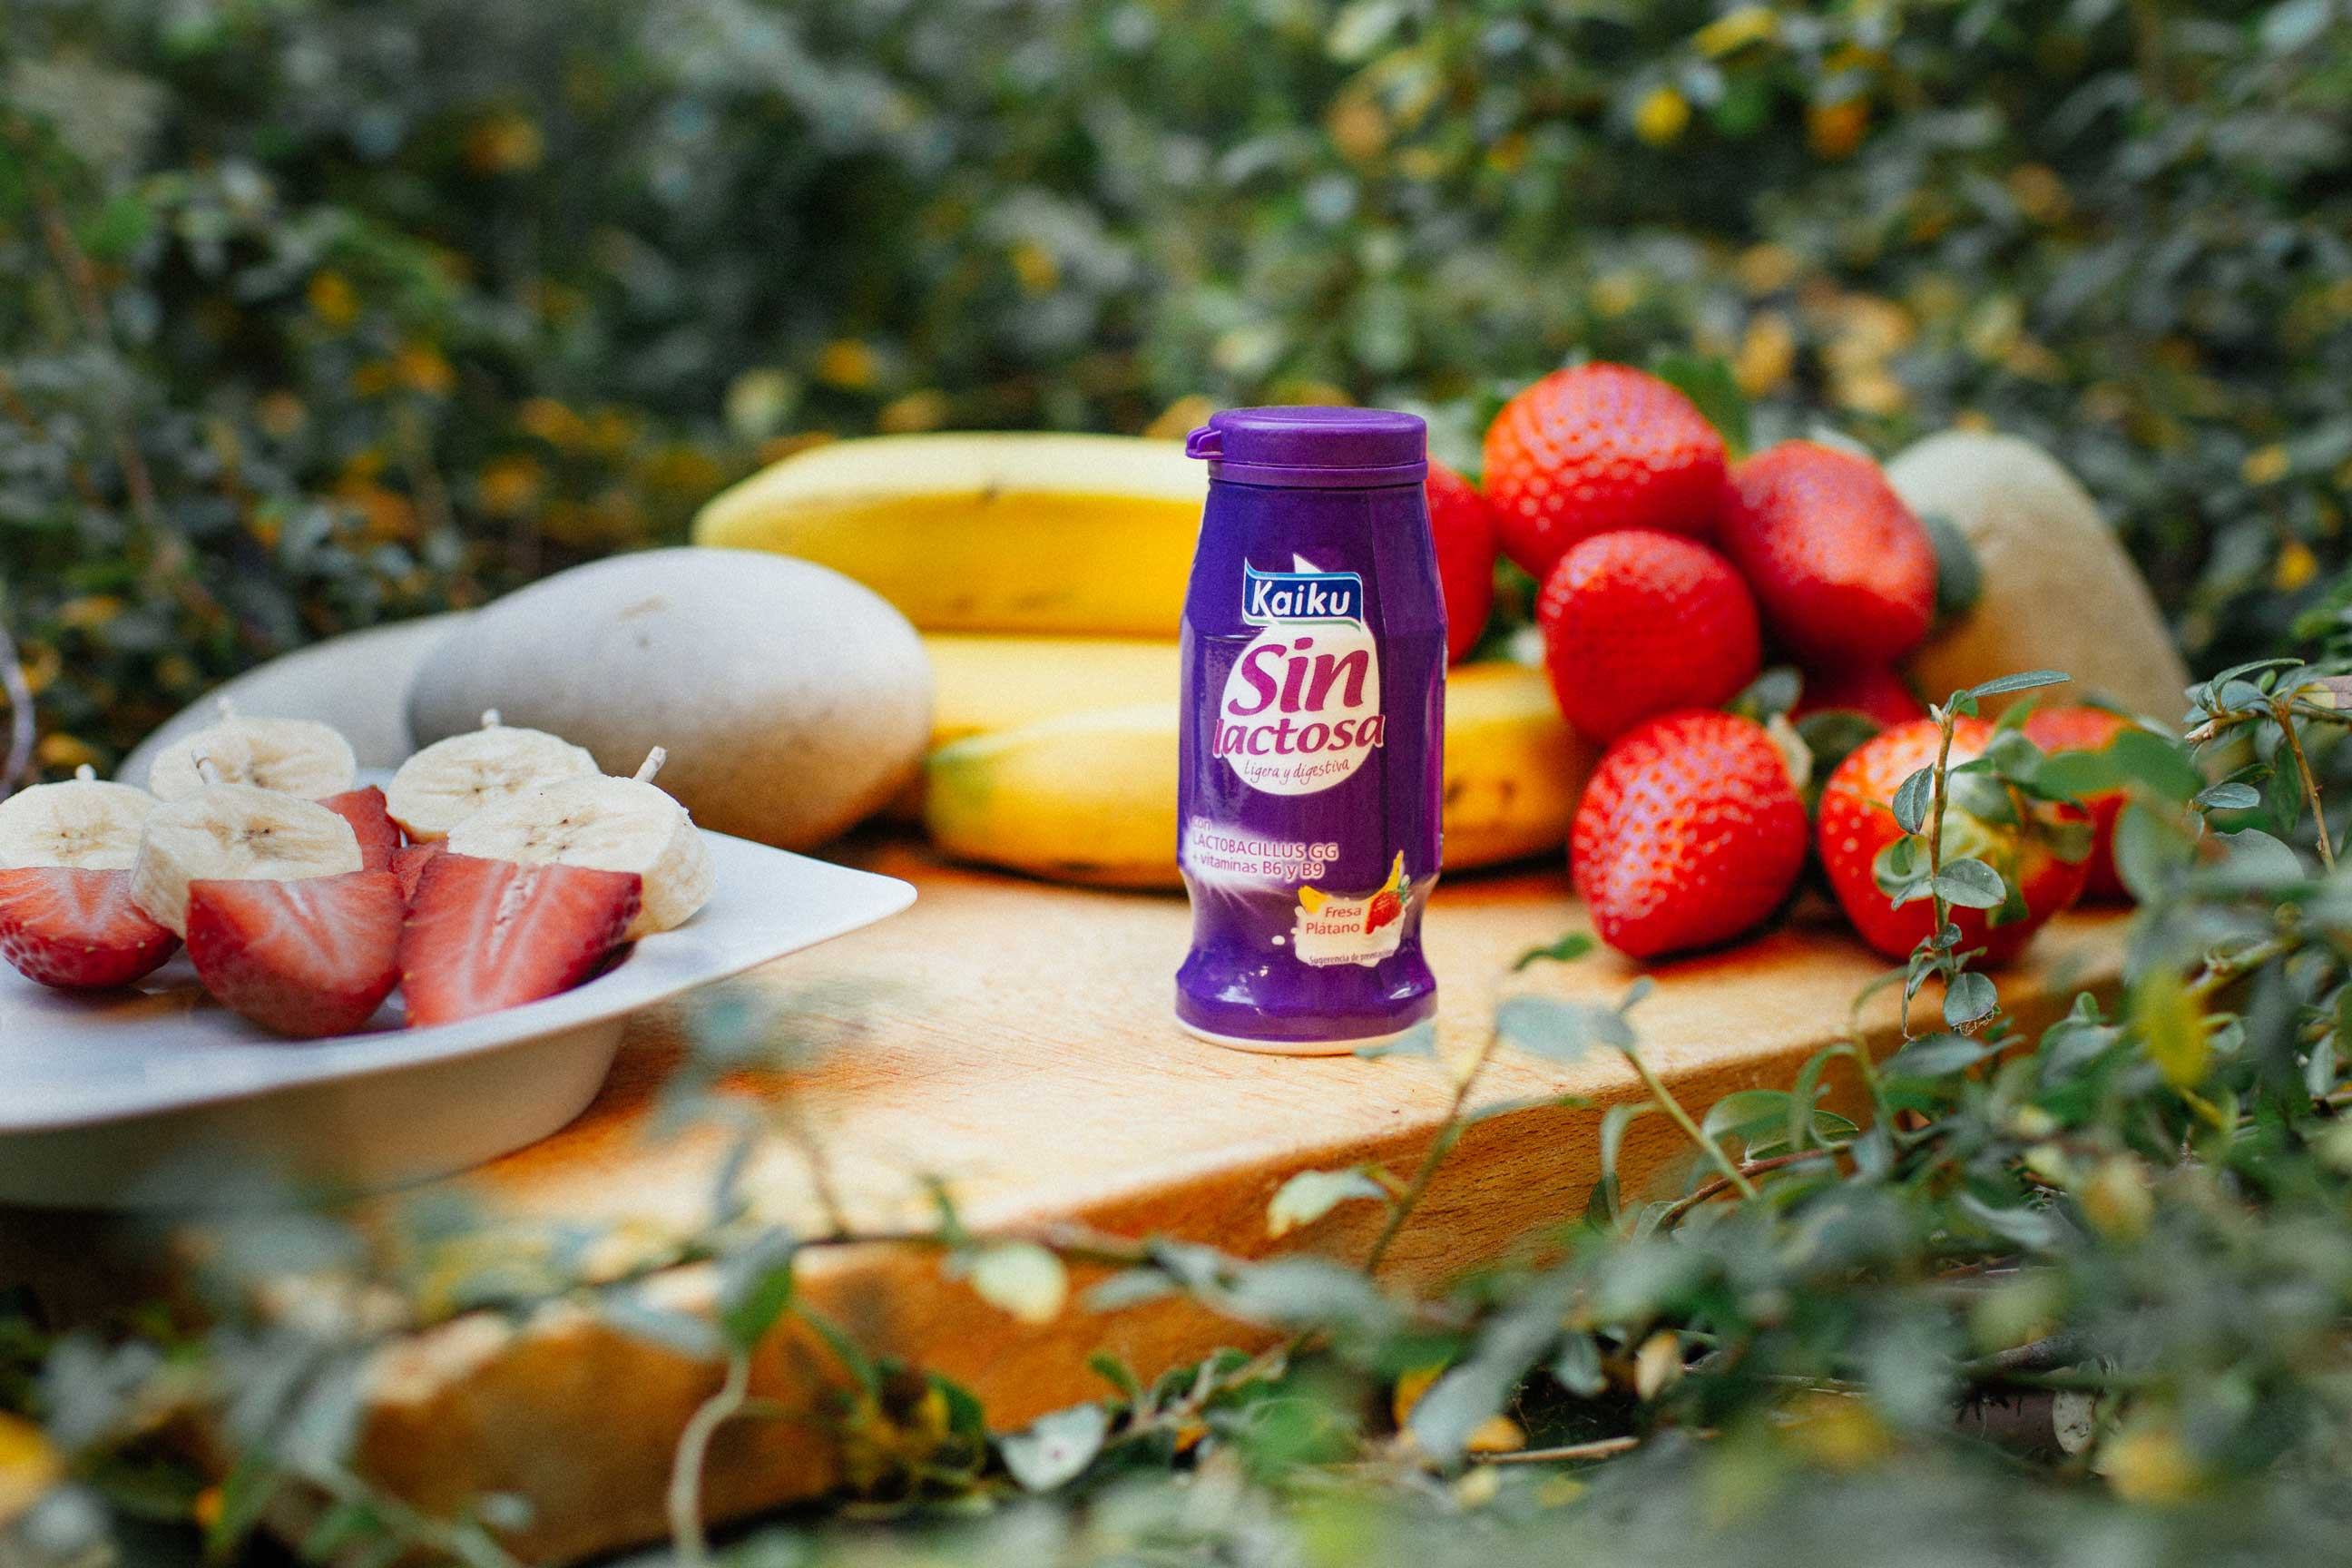 Kaiku-Sin-Lactosa-Productos-Lacteos-Beneficios